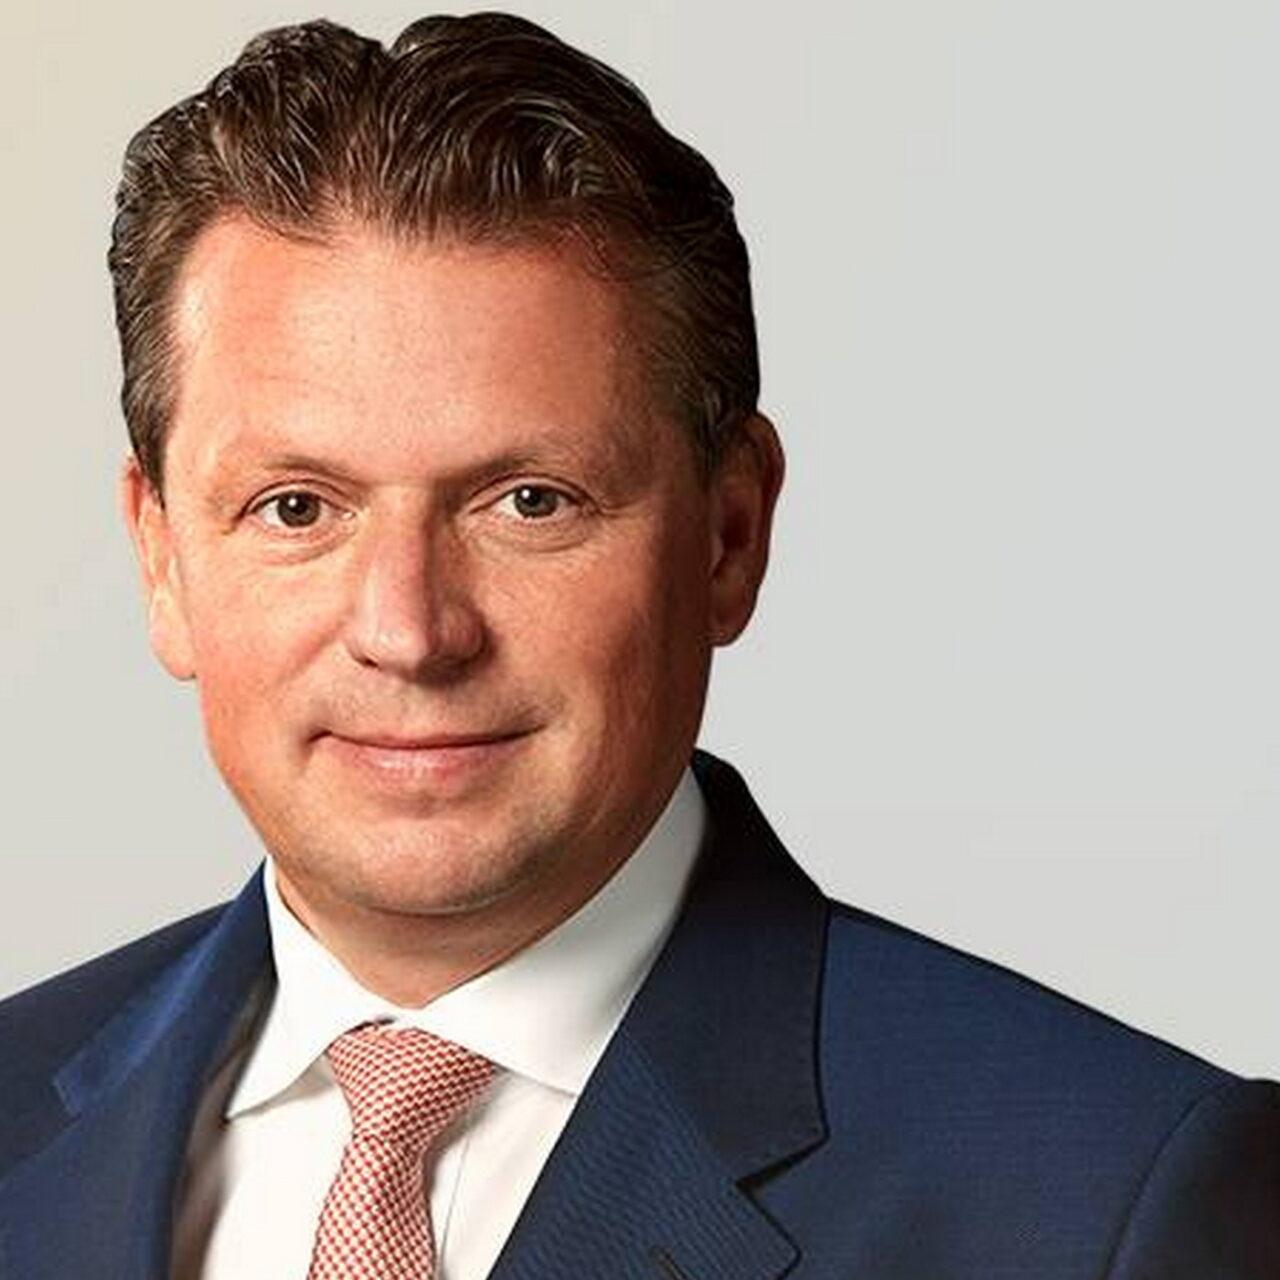 Prime Capital beruft Dr. Drill in Aufsichtsrat